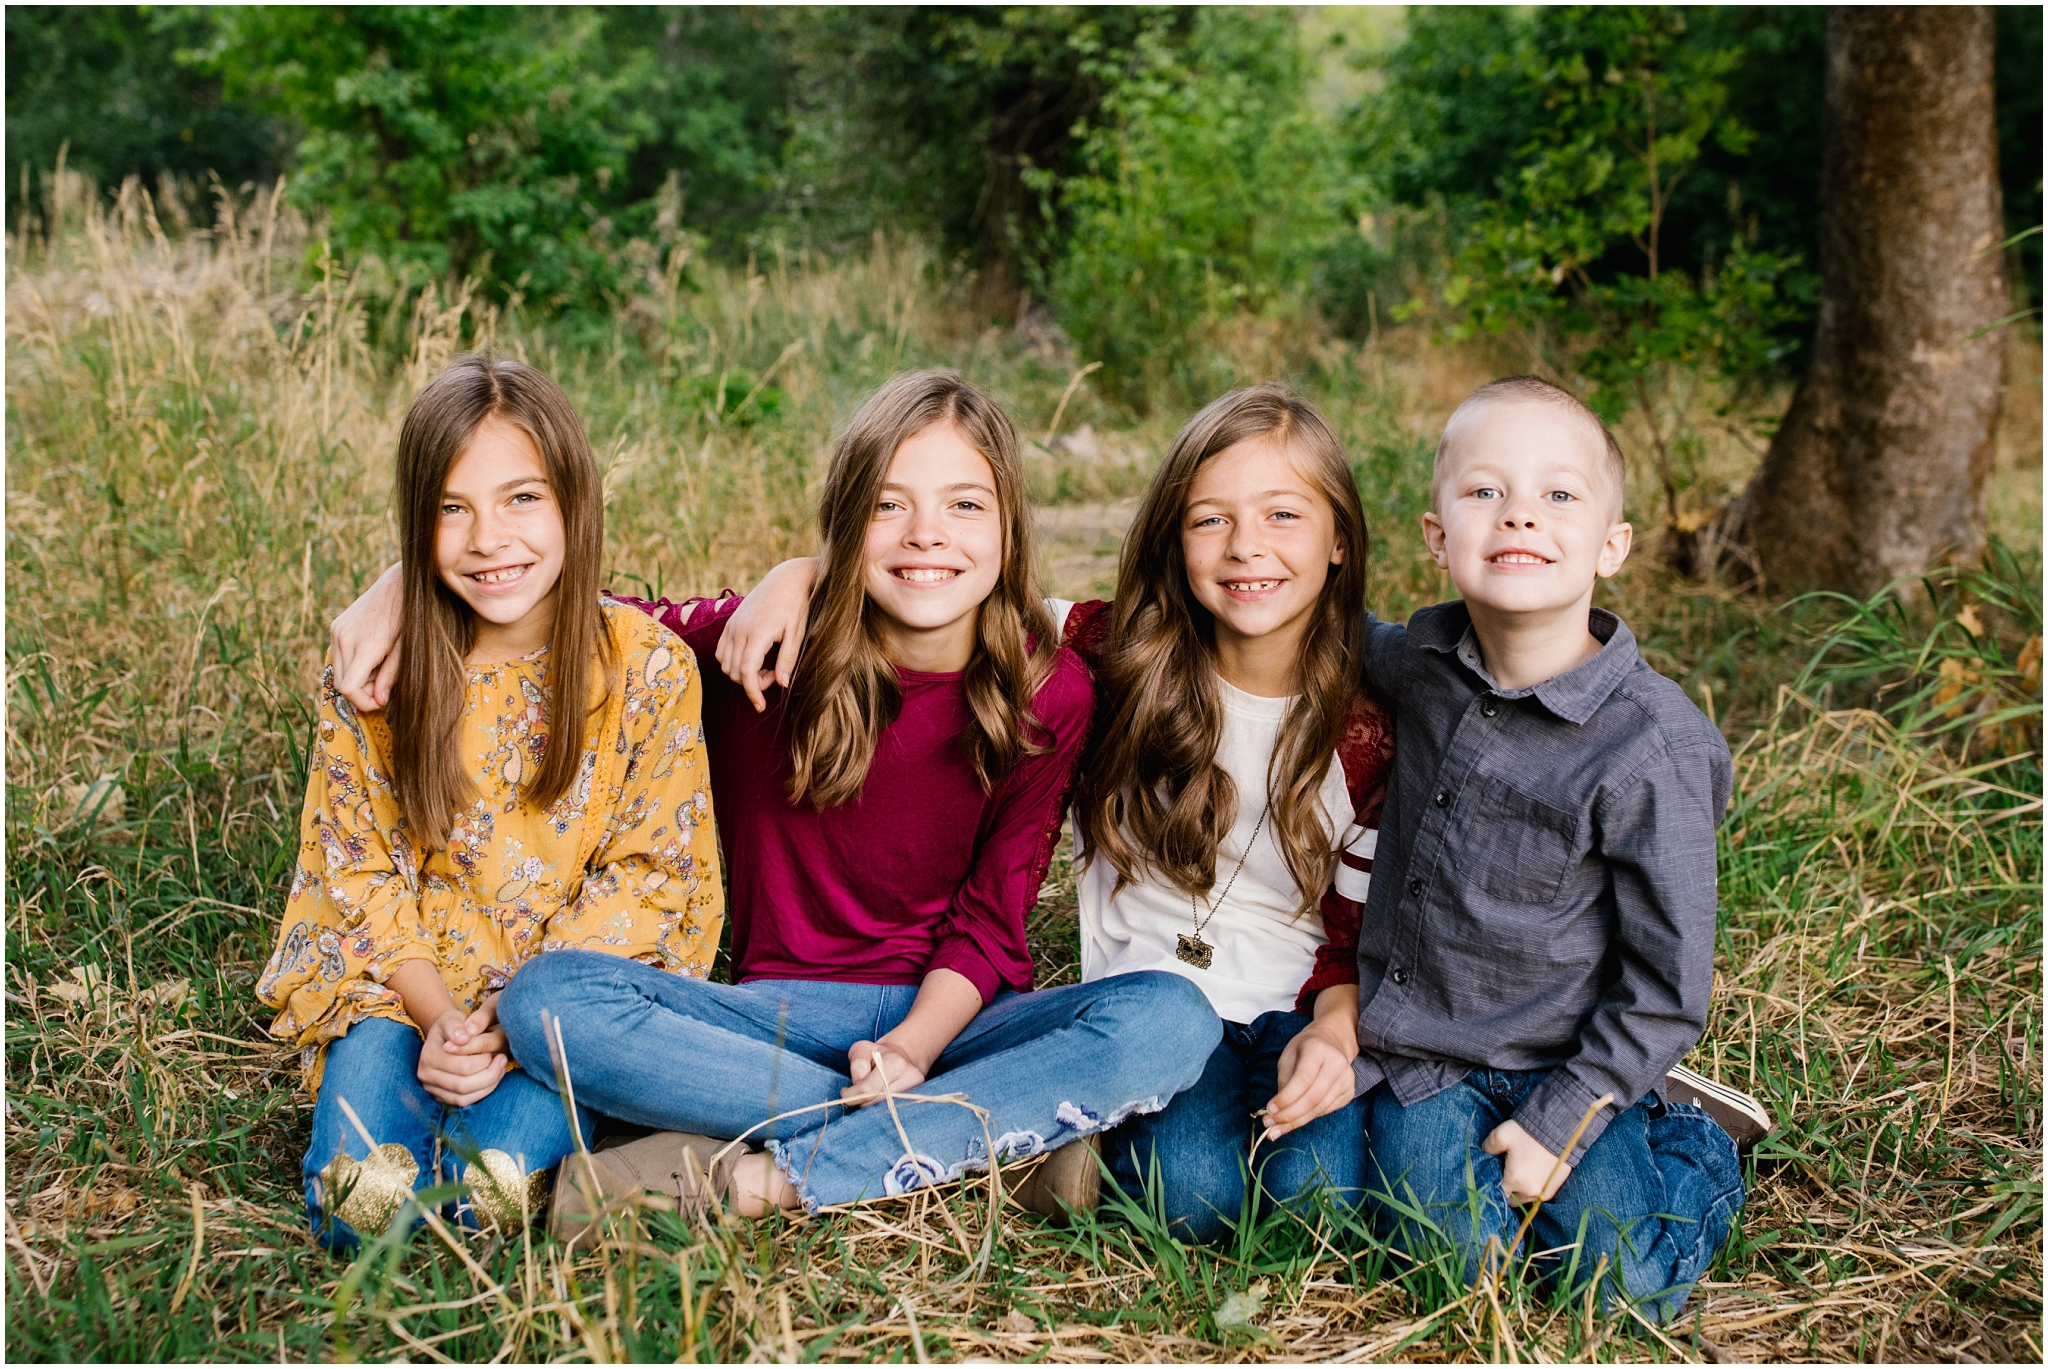 Hurst-8_Lizzie-B-Imagery-Utah-Family-Photographer-Hobble-Creek-Canyon-Jolleys-Ranch-Utah-County.jpg